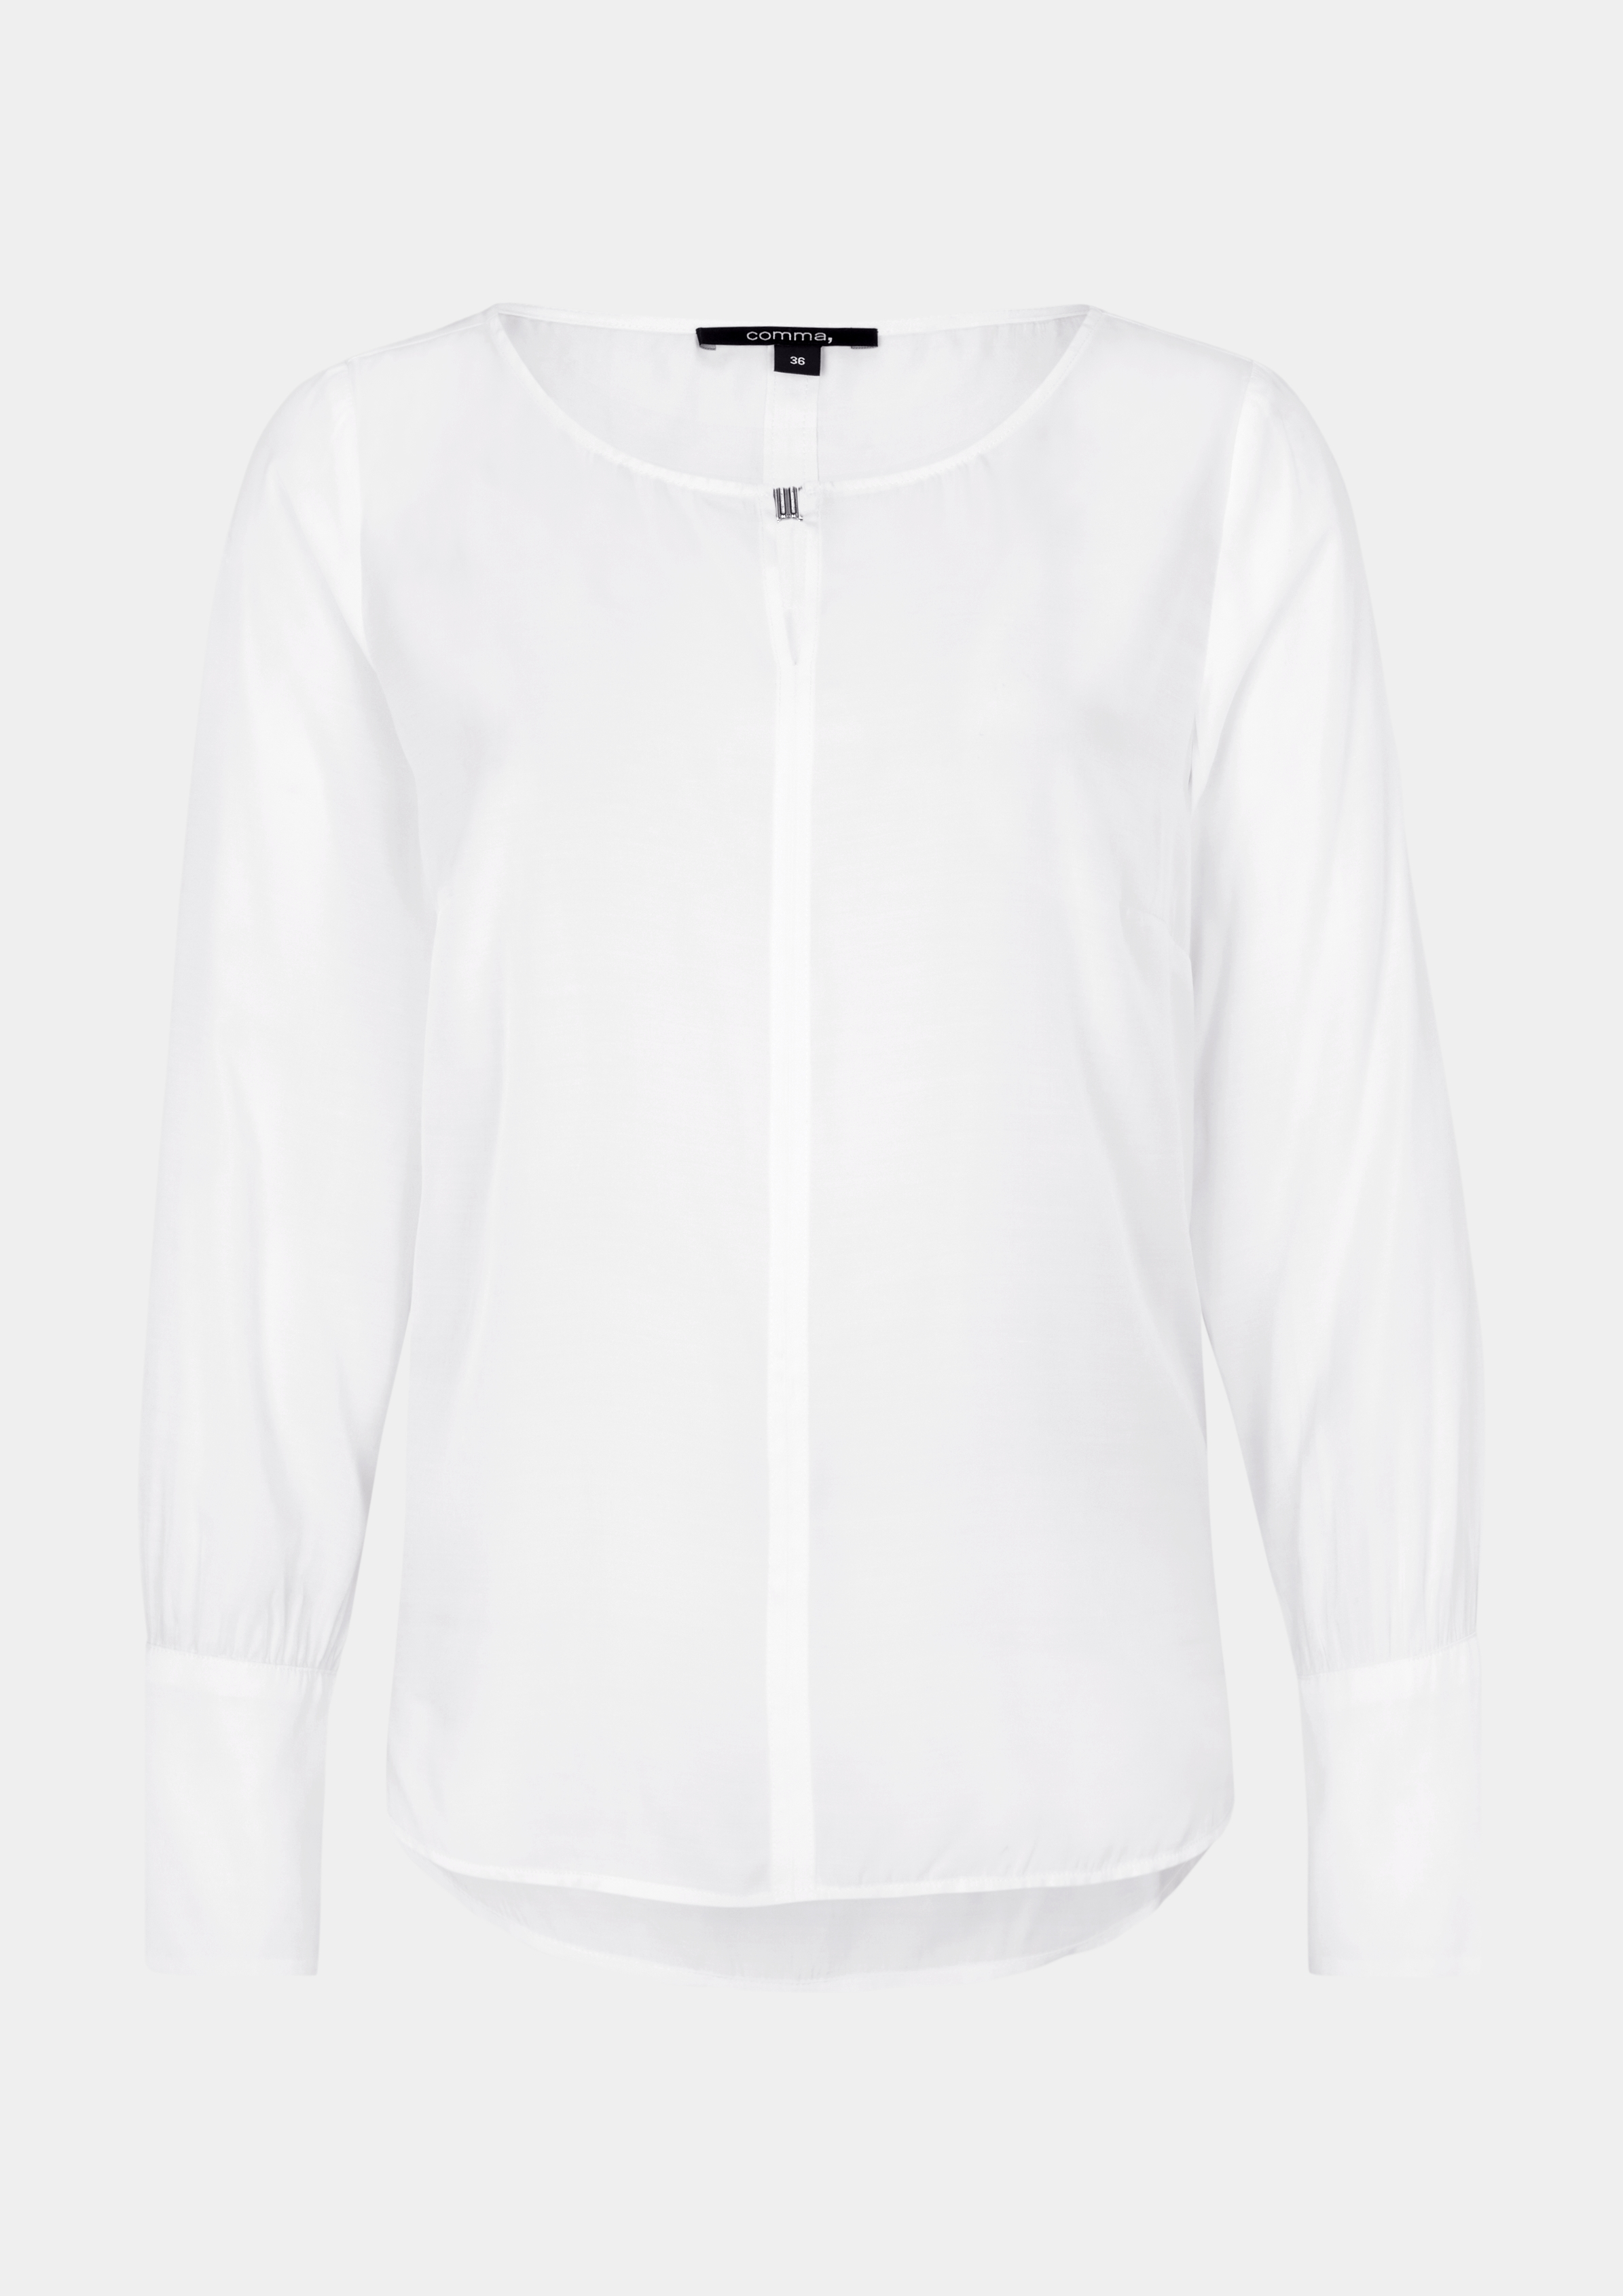 Satinbluse   Bekleidung > Blusen > Satinblusen   Weiß   55% viskose -  45% polyester   comma